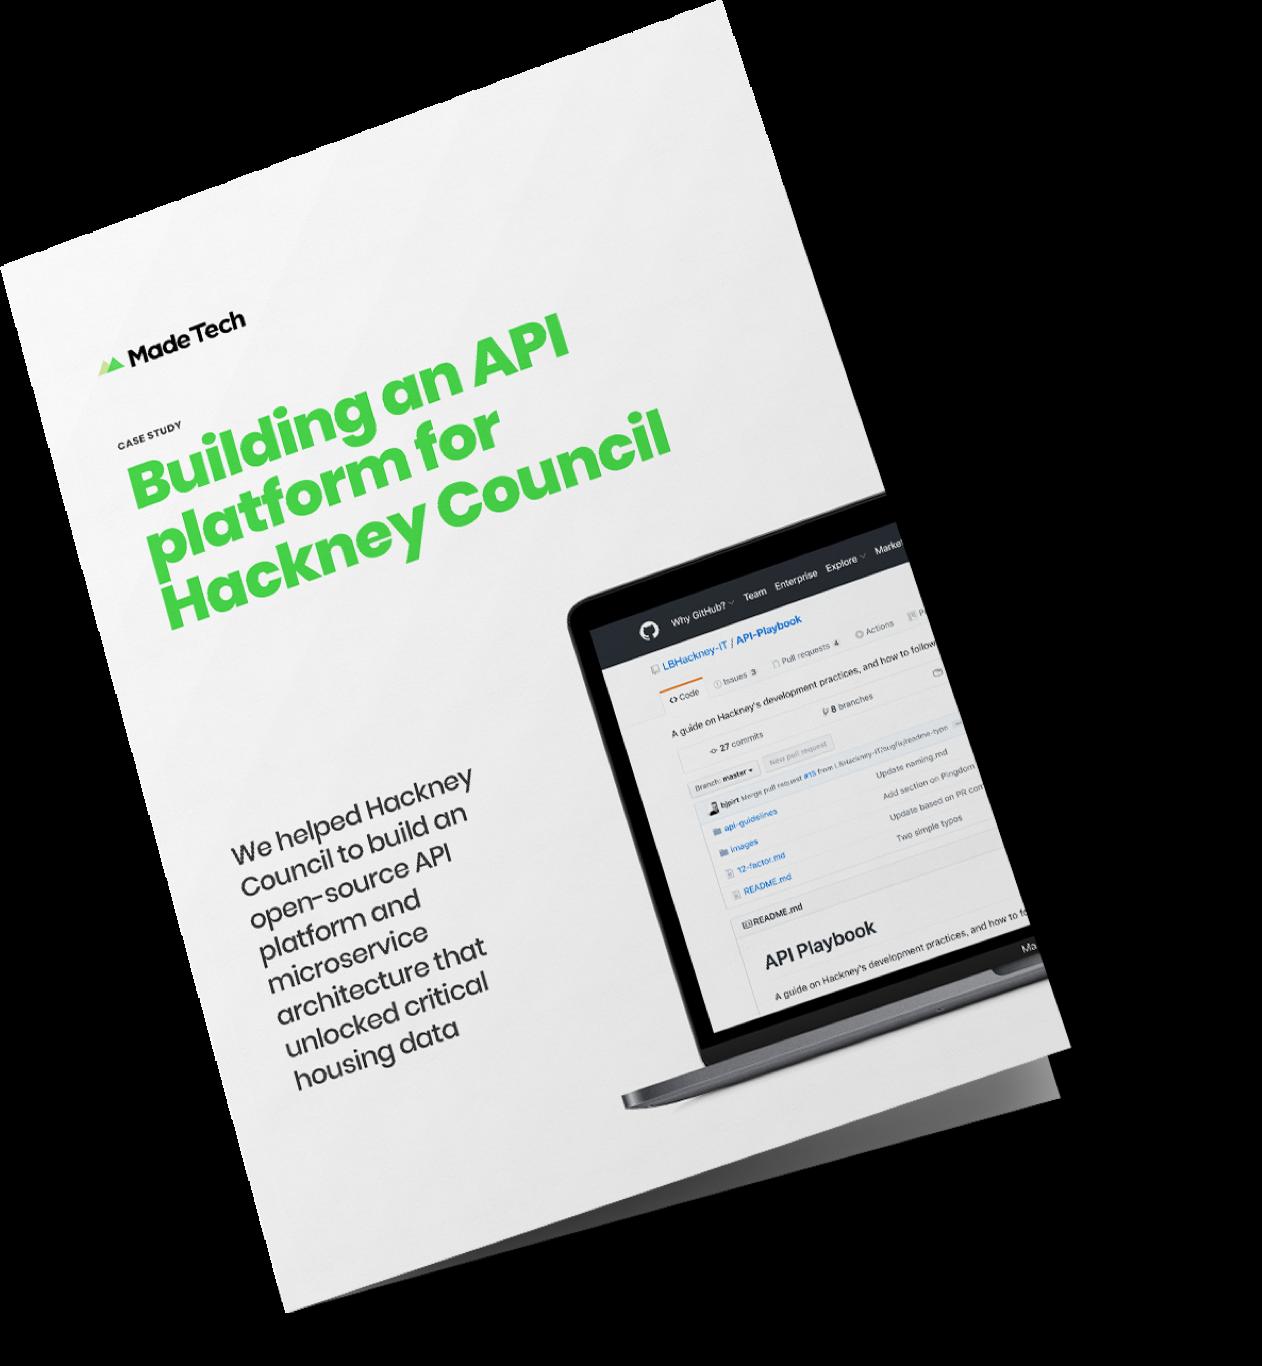 Building an API platform for Hackney Council case study cover